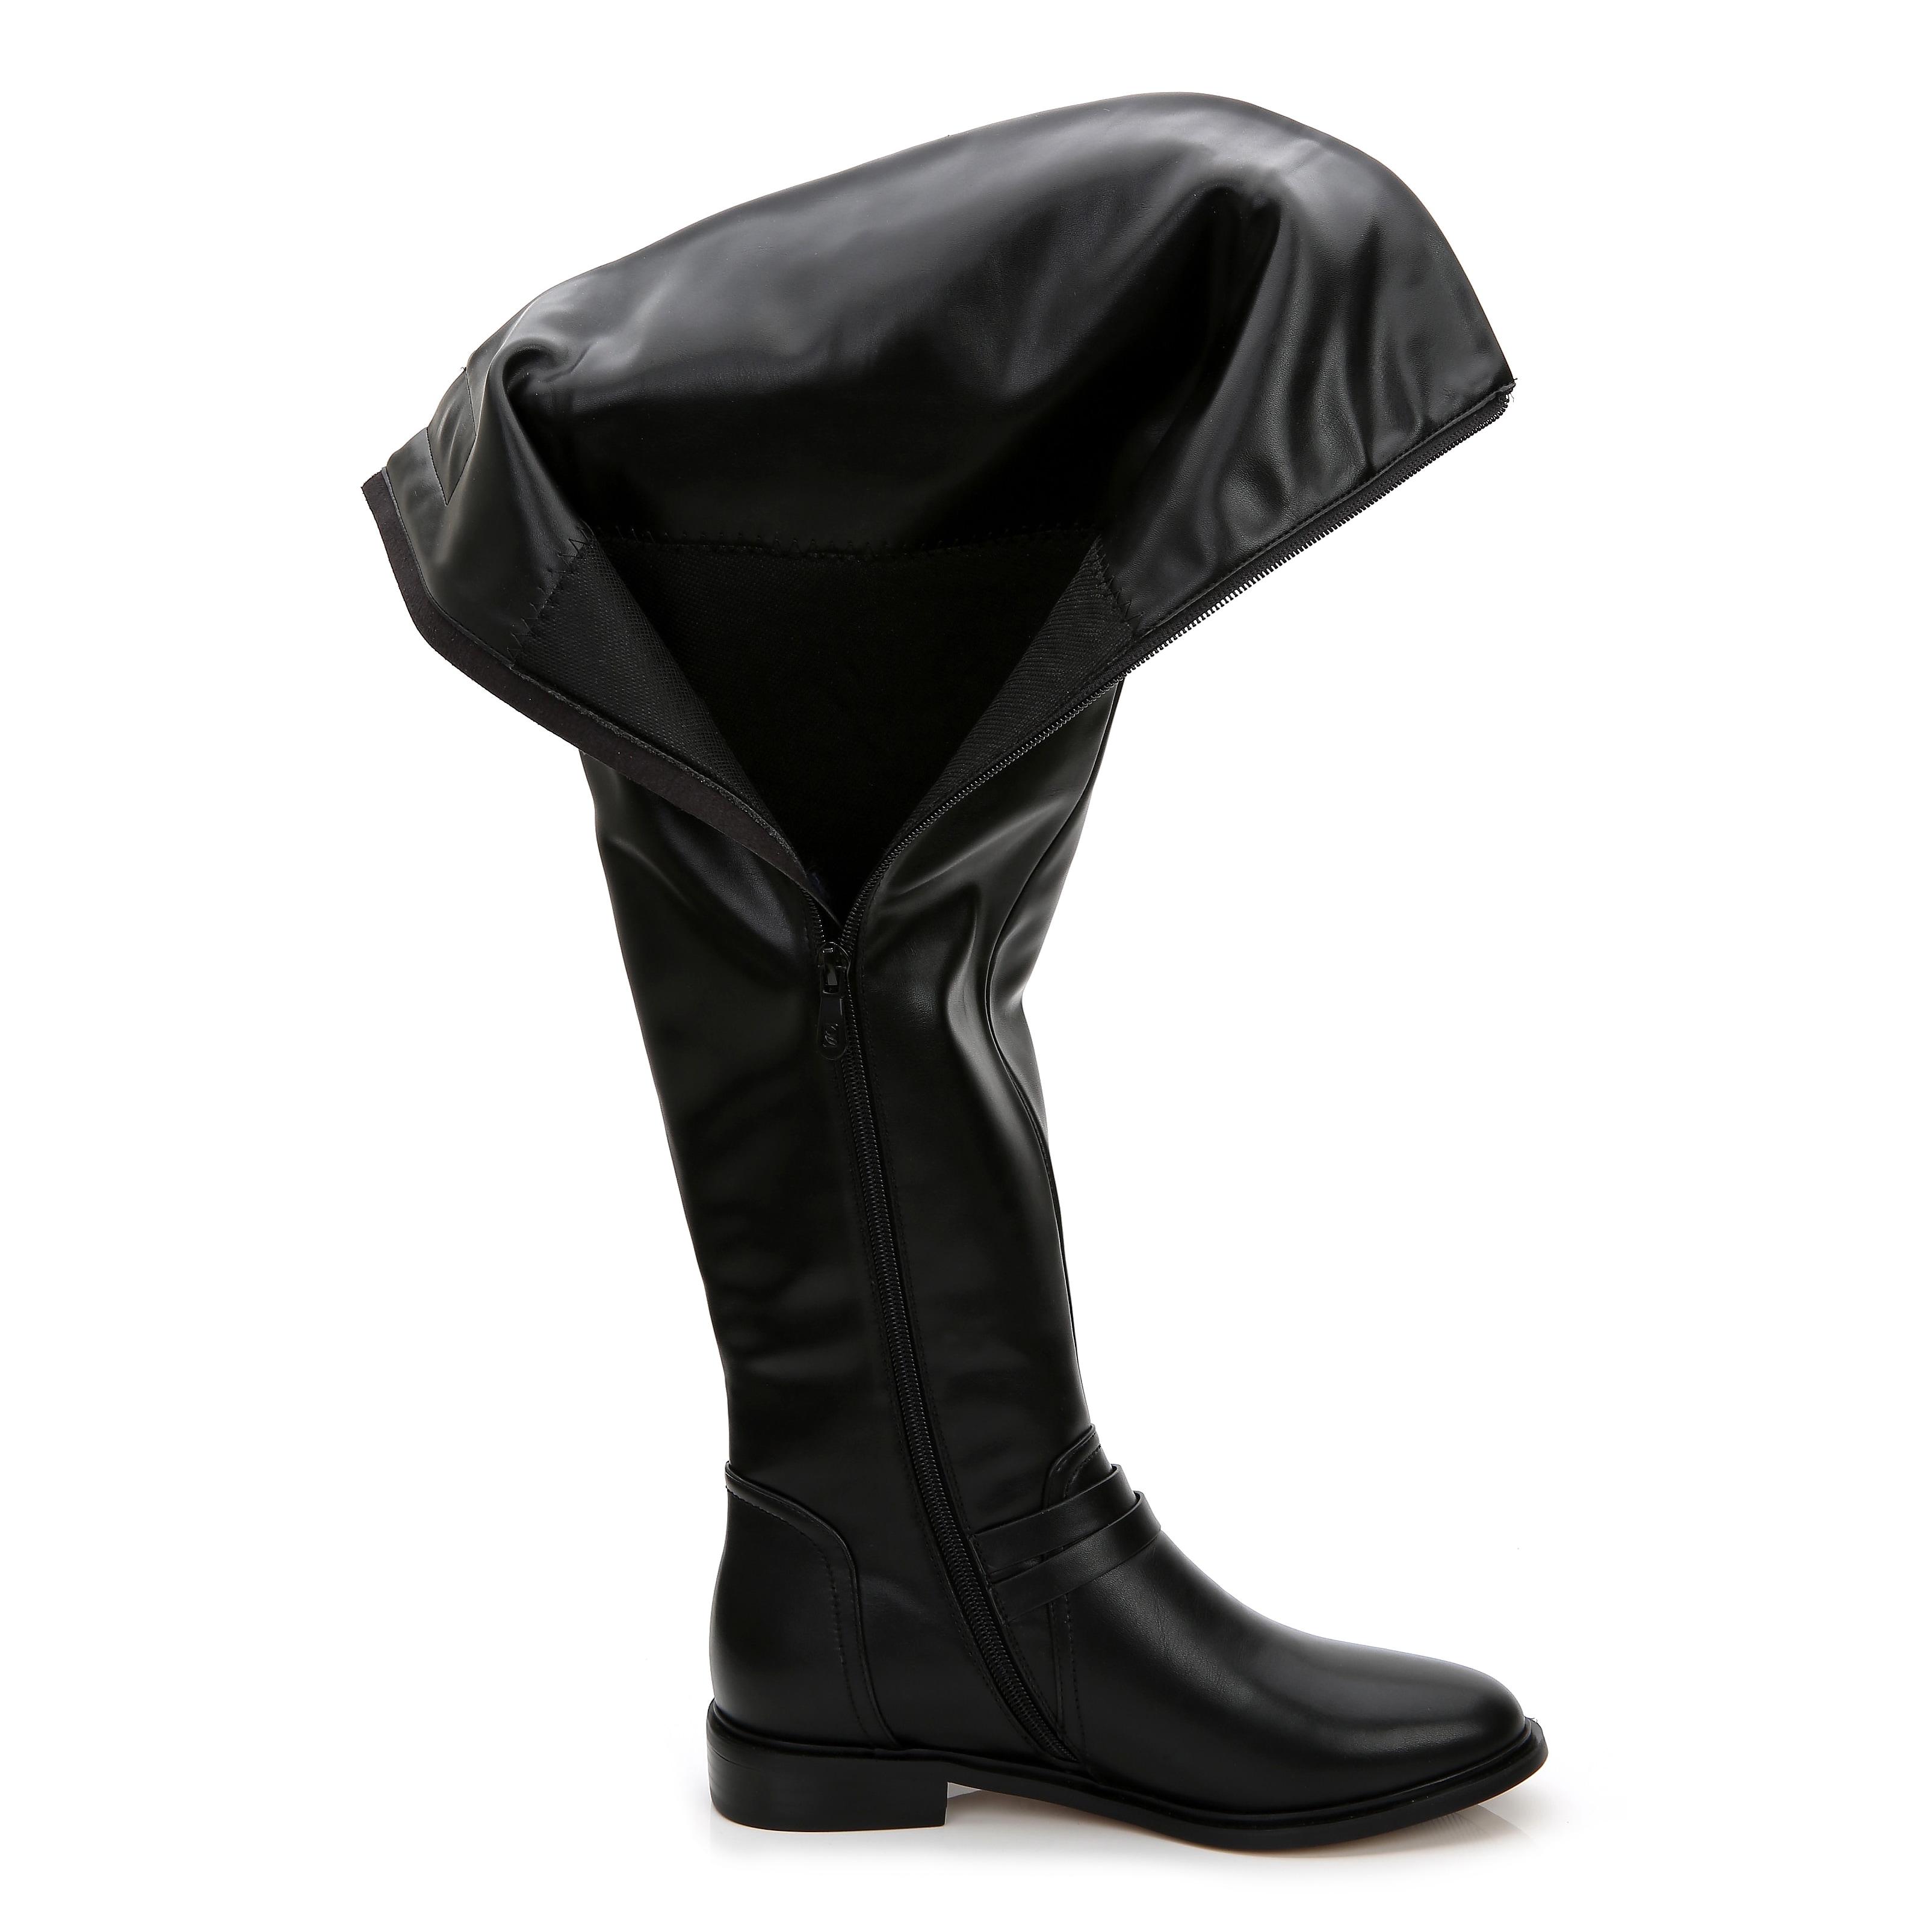 homme / femme femme / de semelles extérieures: short, san diego, ca: moderne b79865